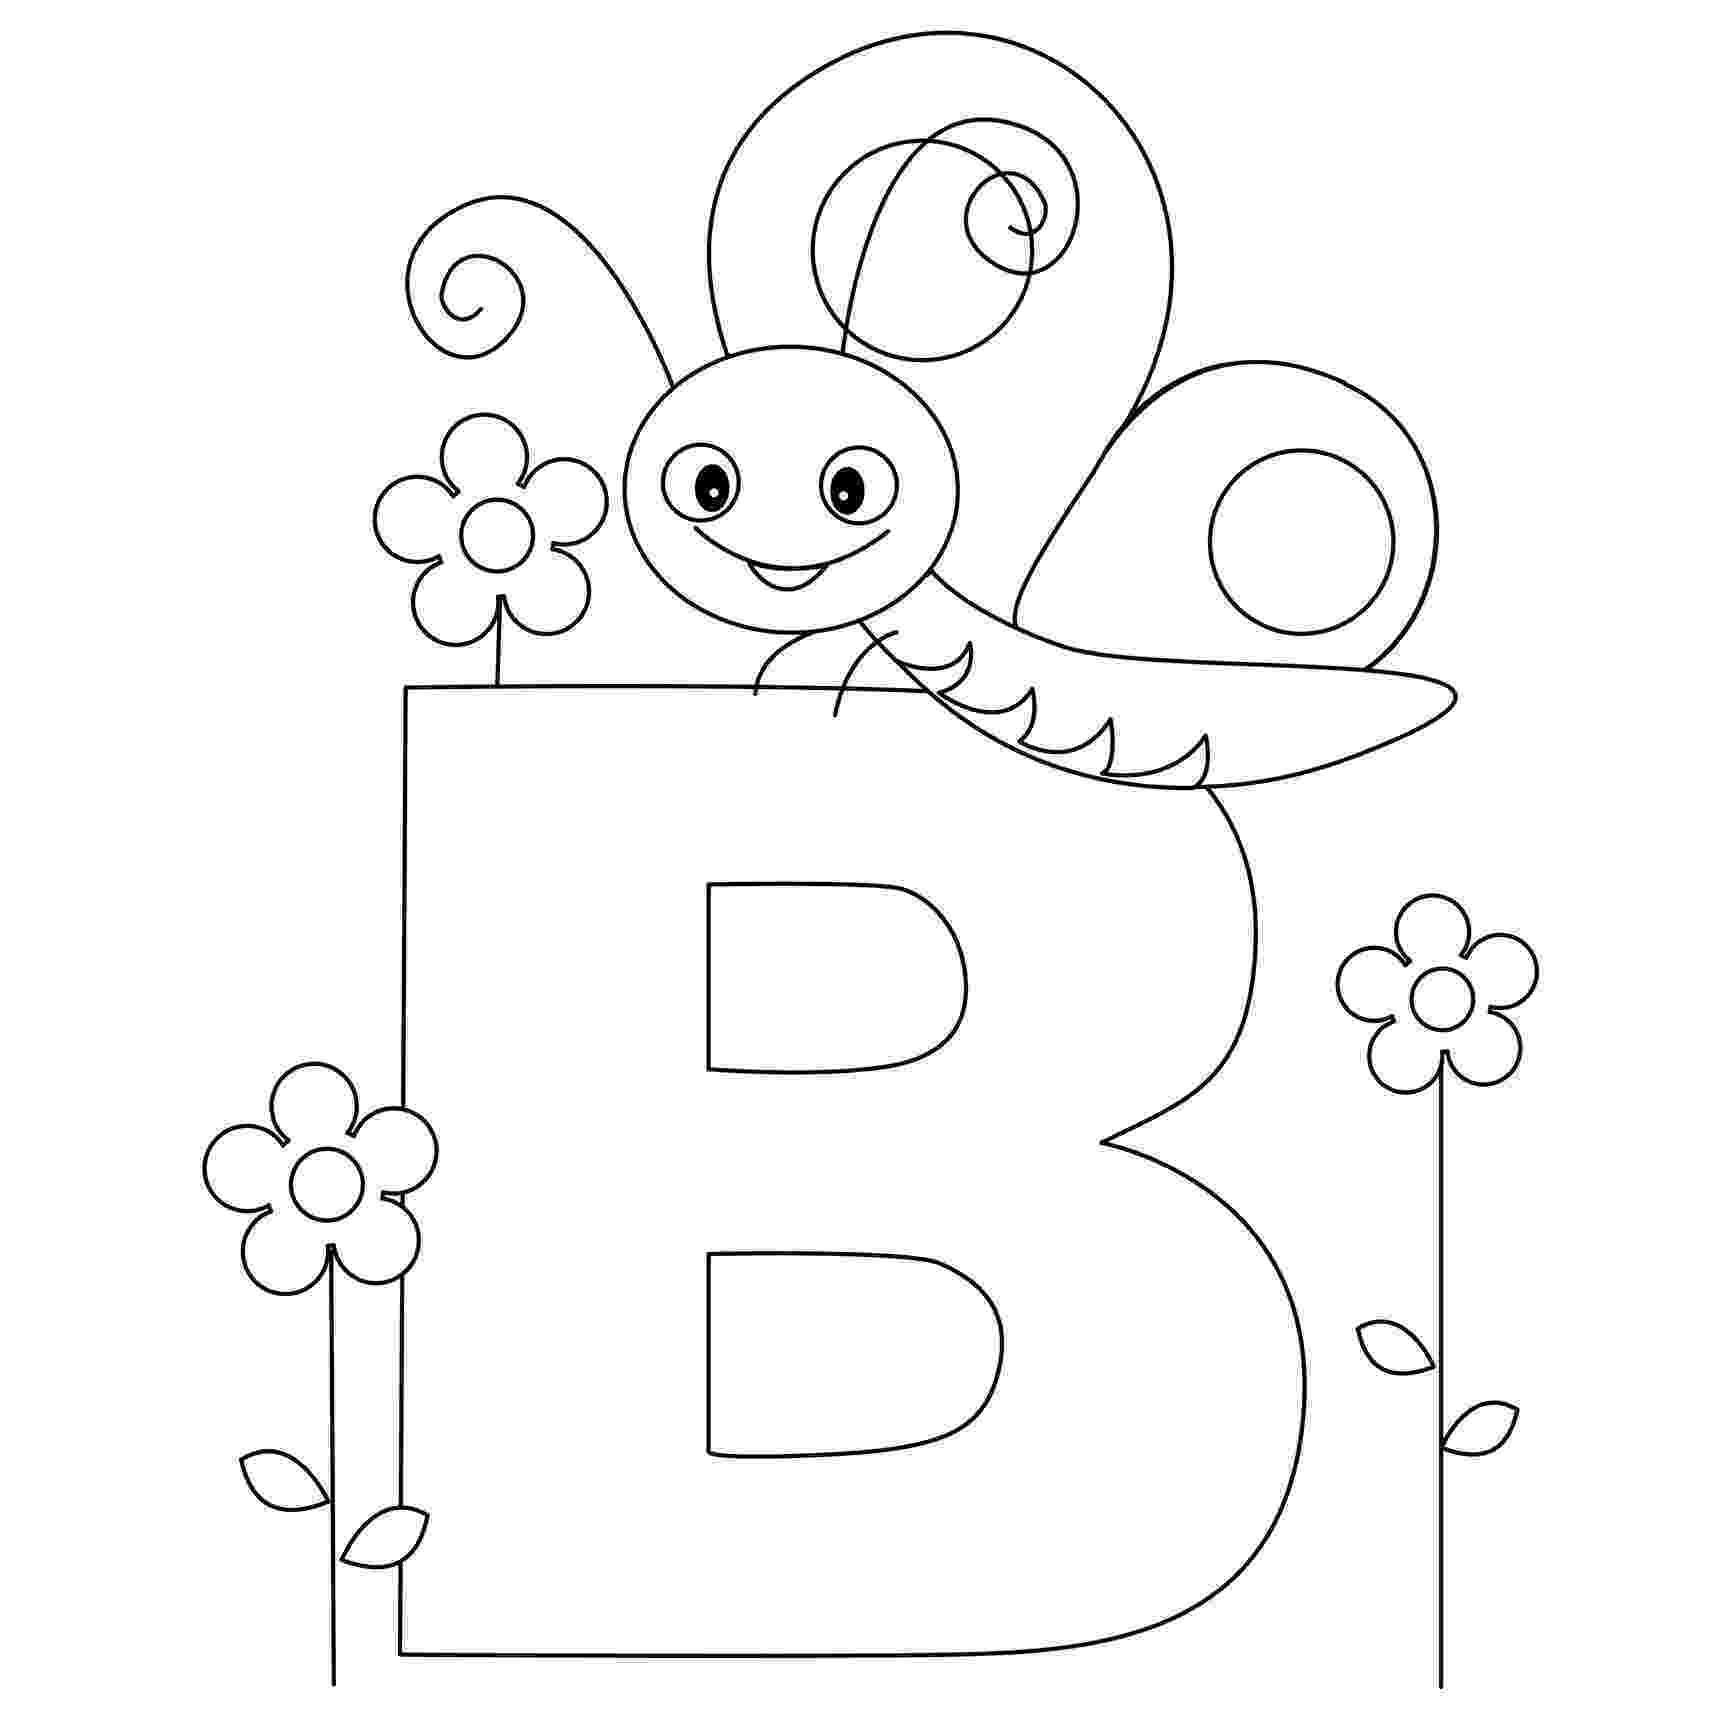 alphabet coloring free printable alphabet coloring pages for kids best alphabet coloring 1 8